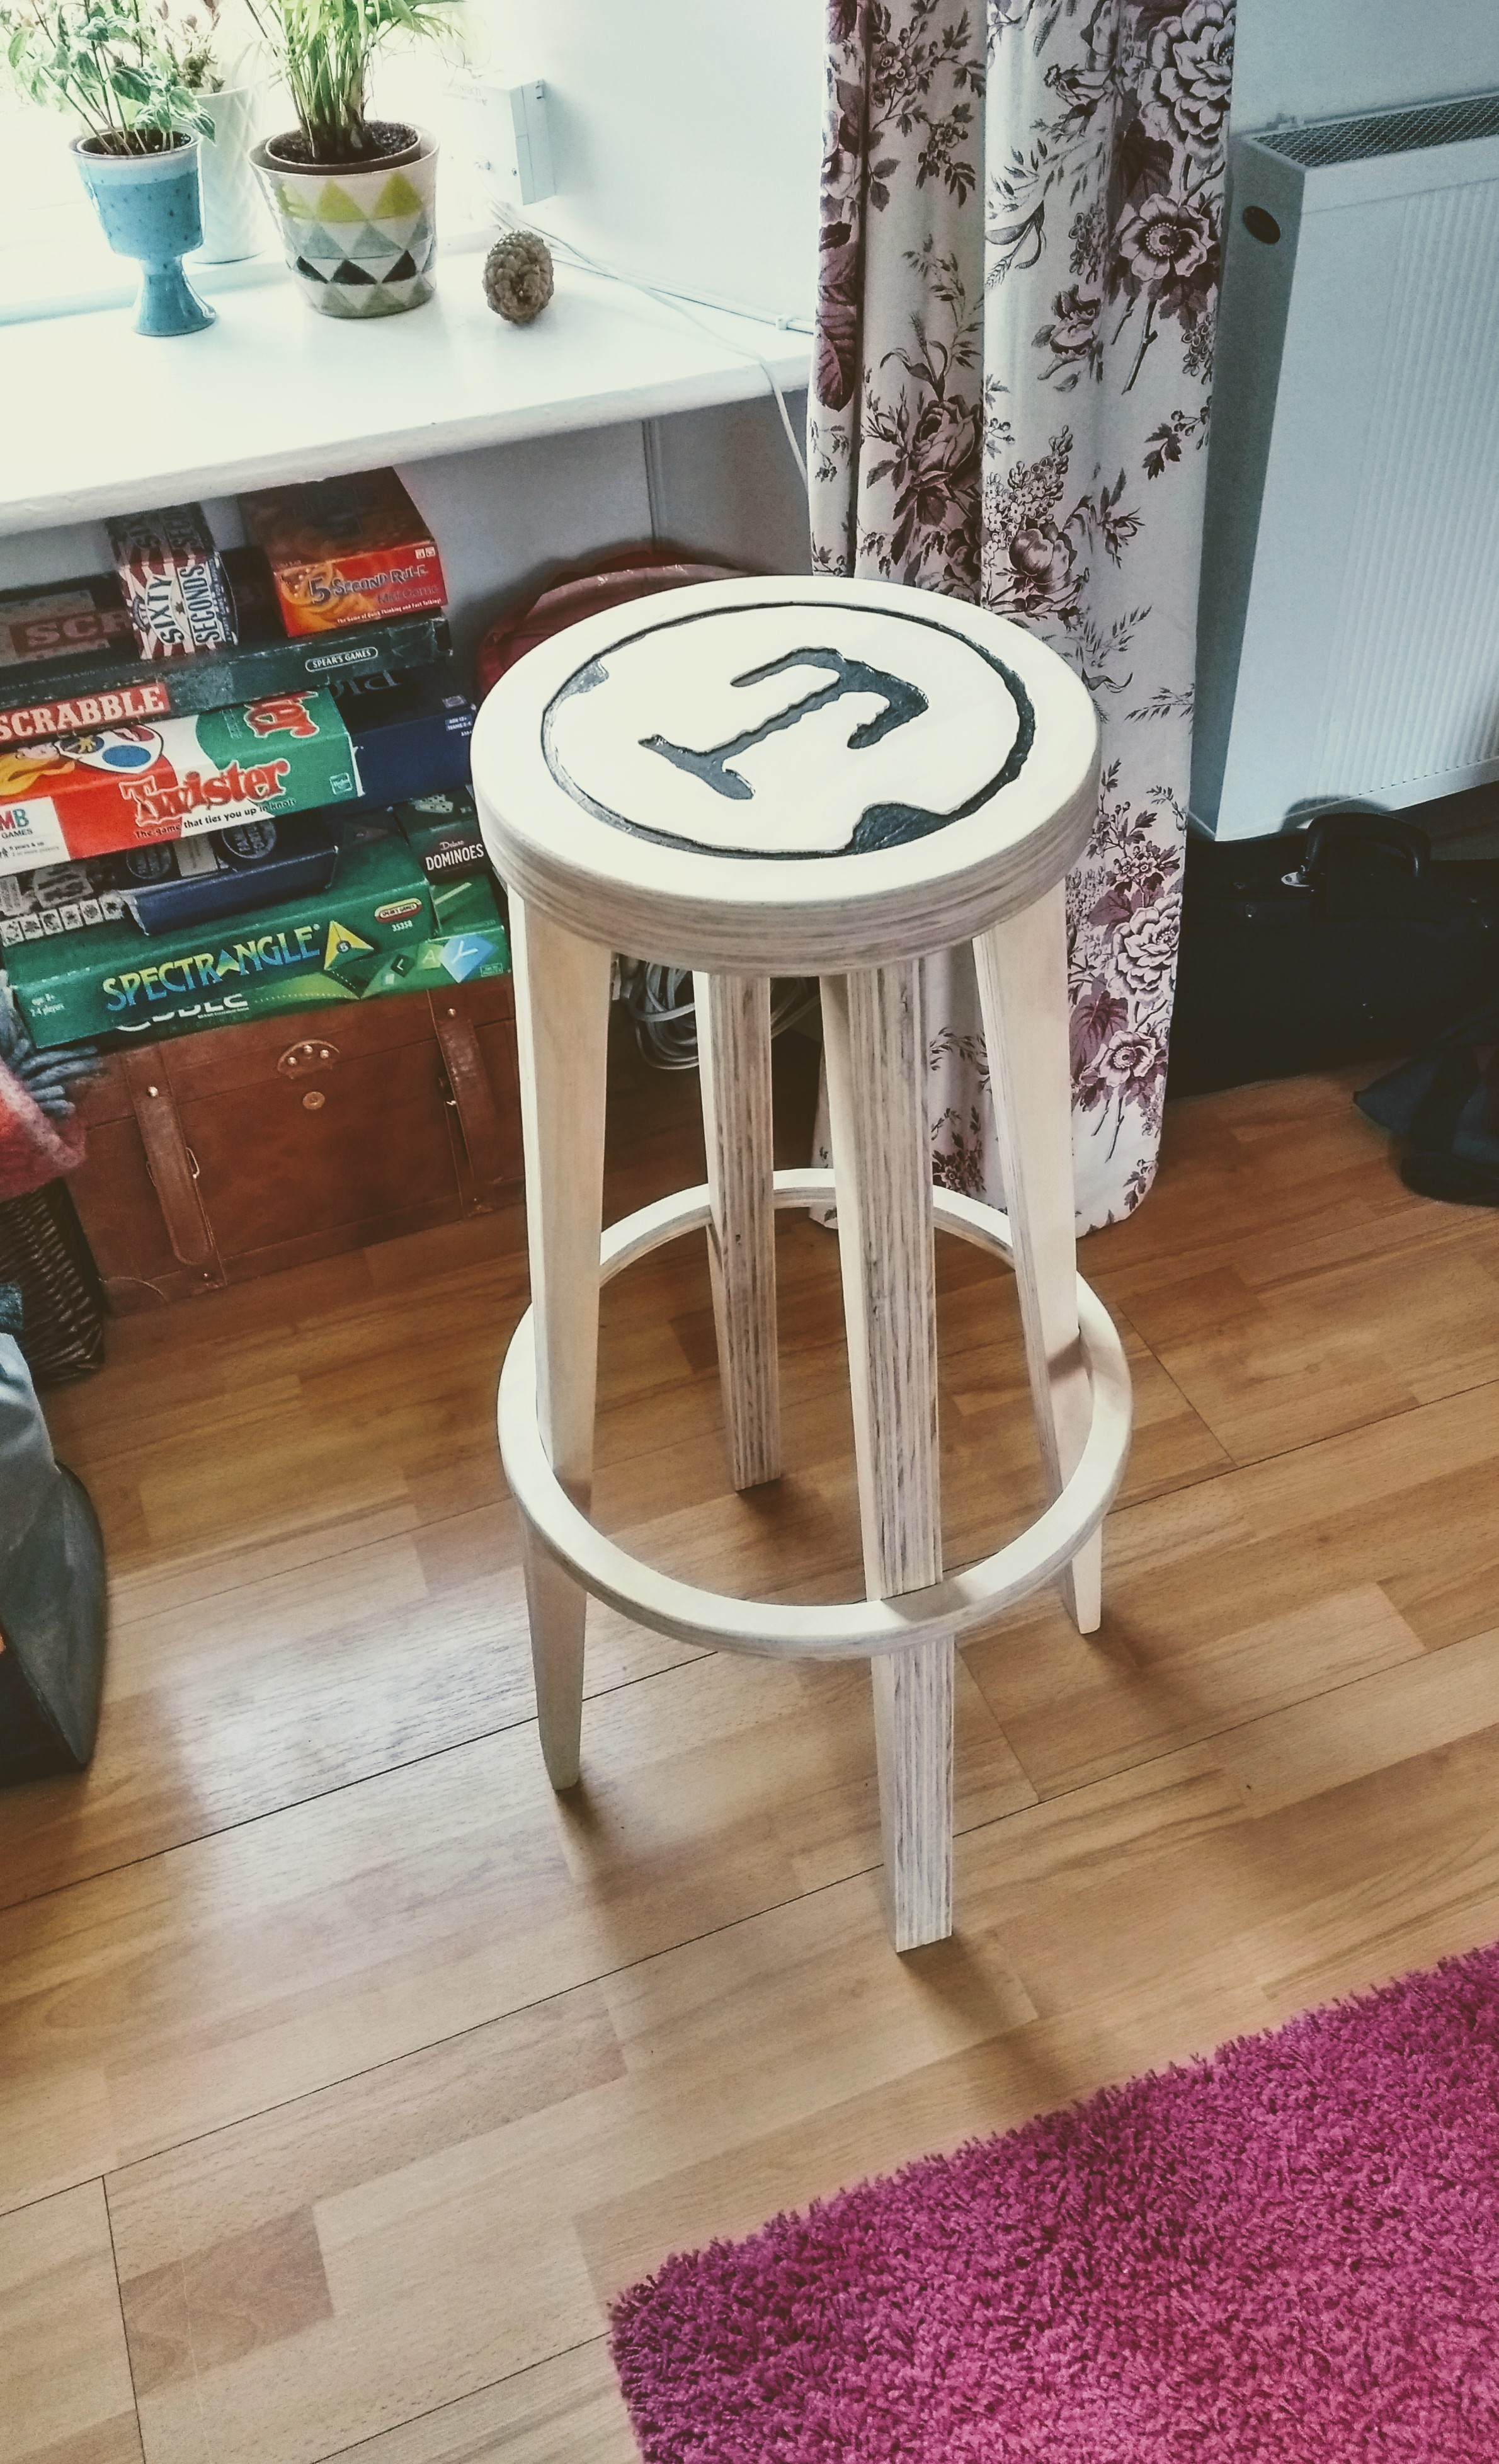 KingOfScolba's nimble stool build